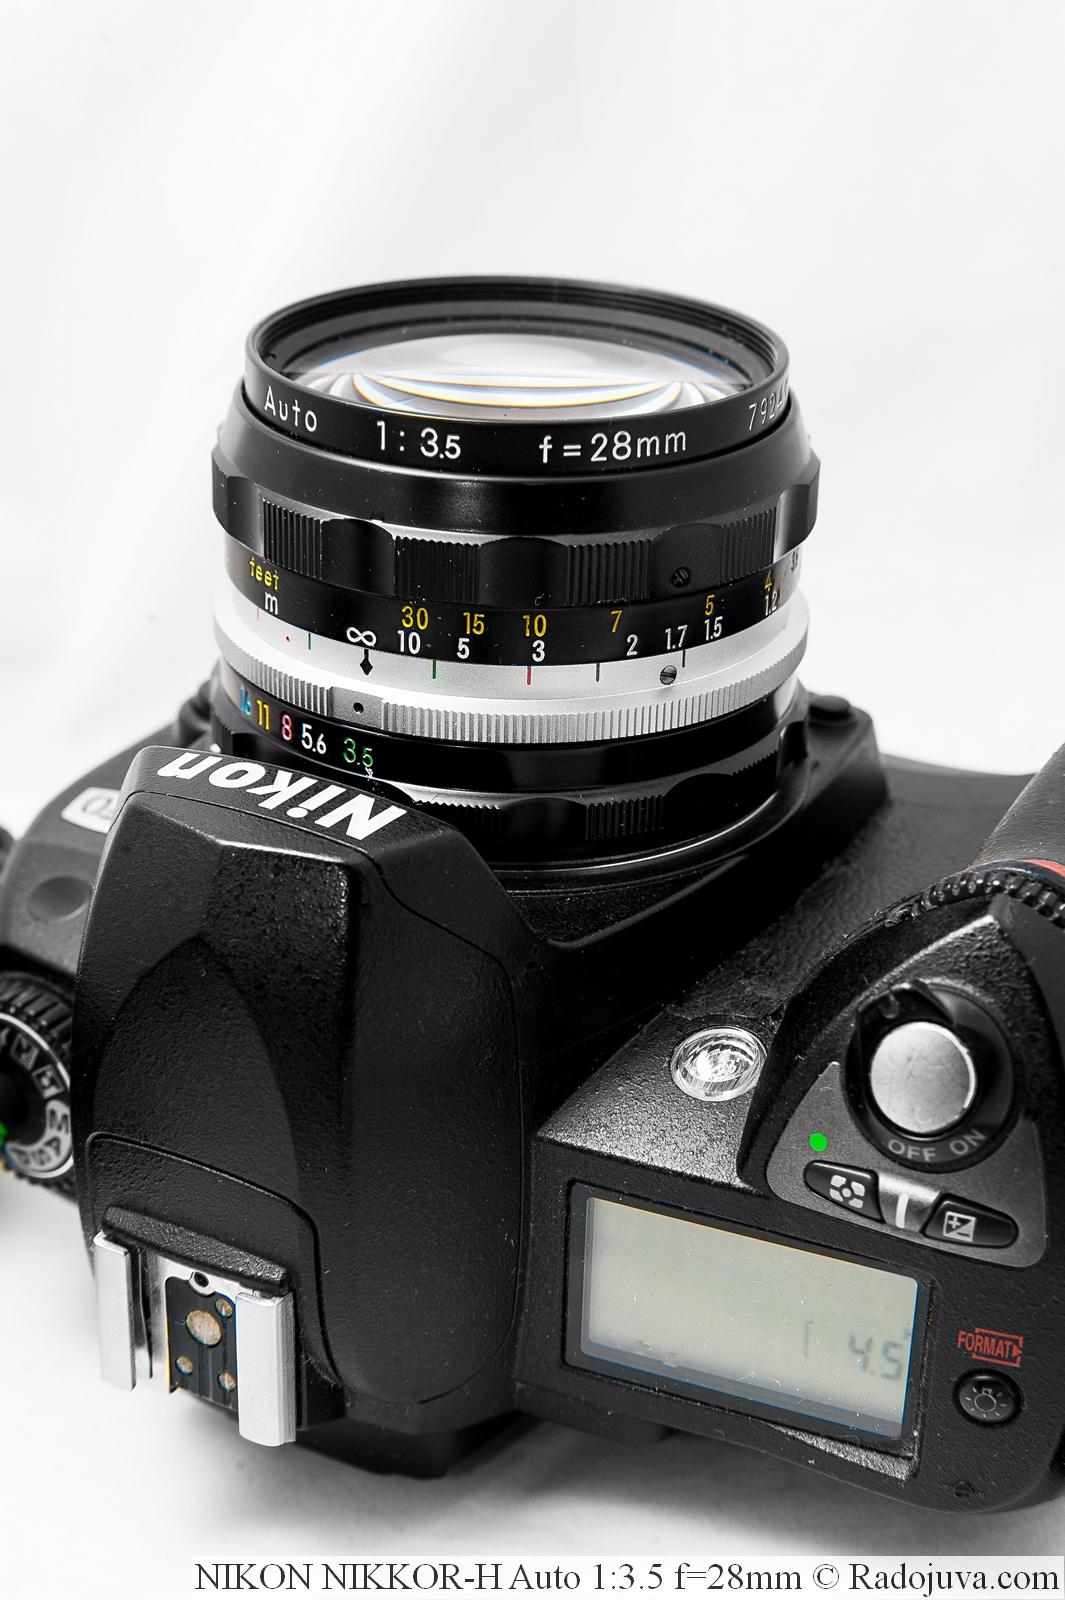 NIKON NIKKOR-H Auto 1:3.5 f=28mm на фотоаппарате Nikon D70